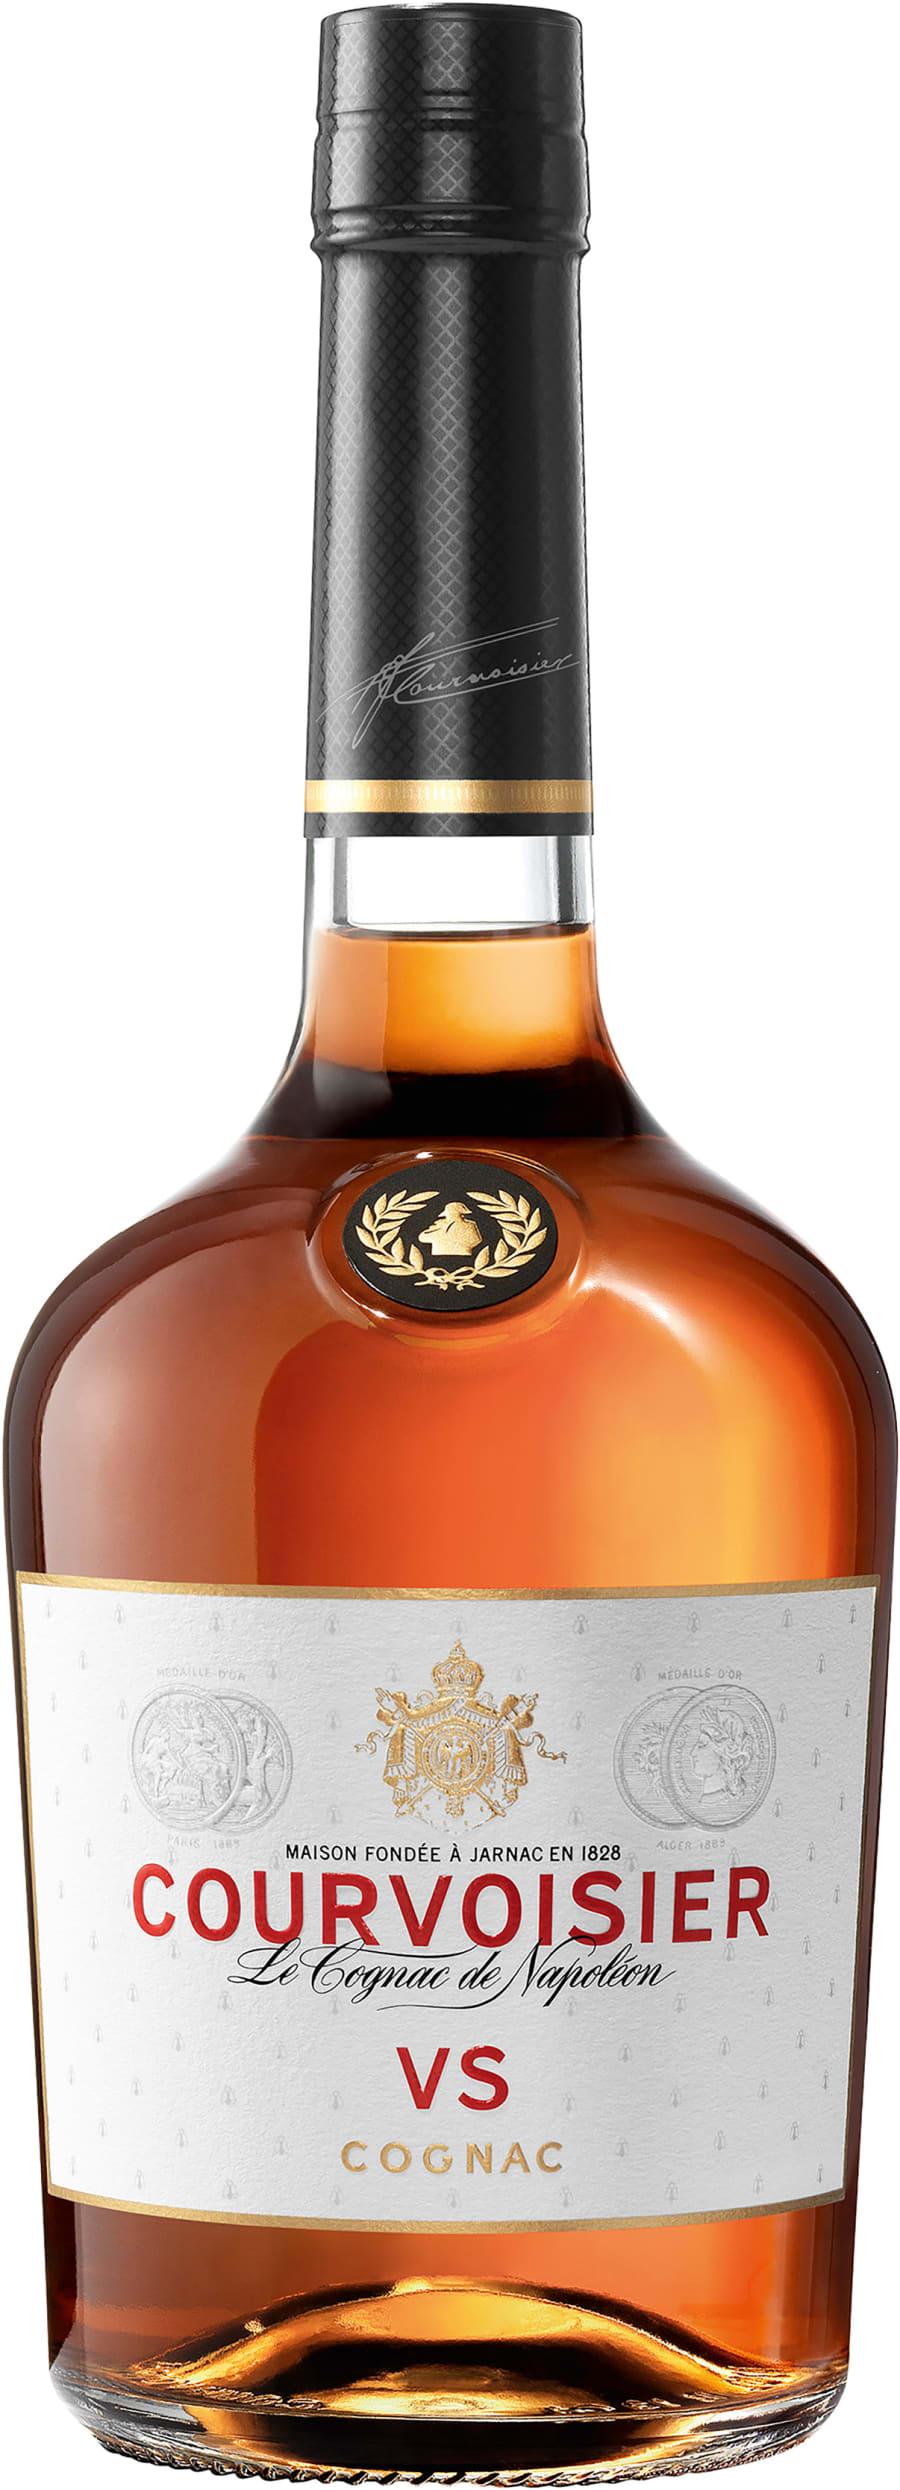 Courvoisier vs cognacs alko zoom icon courvoisier altavistaventures Images